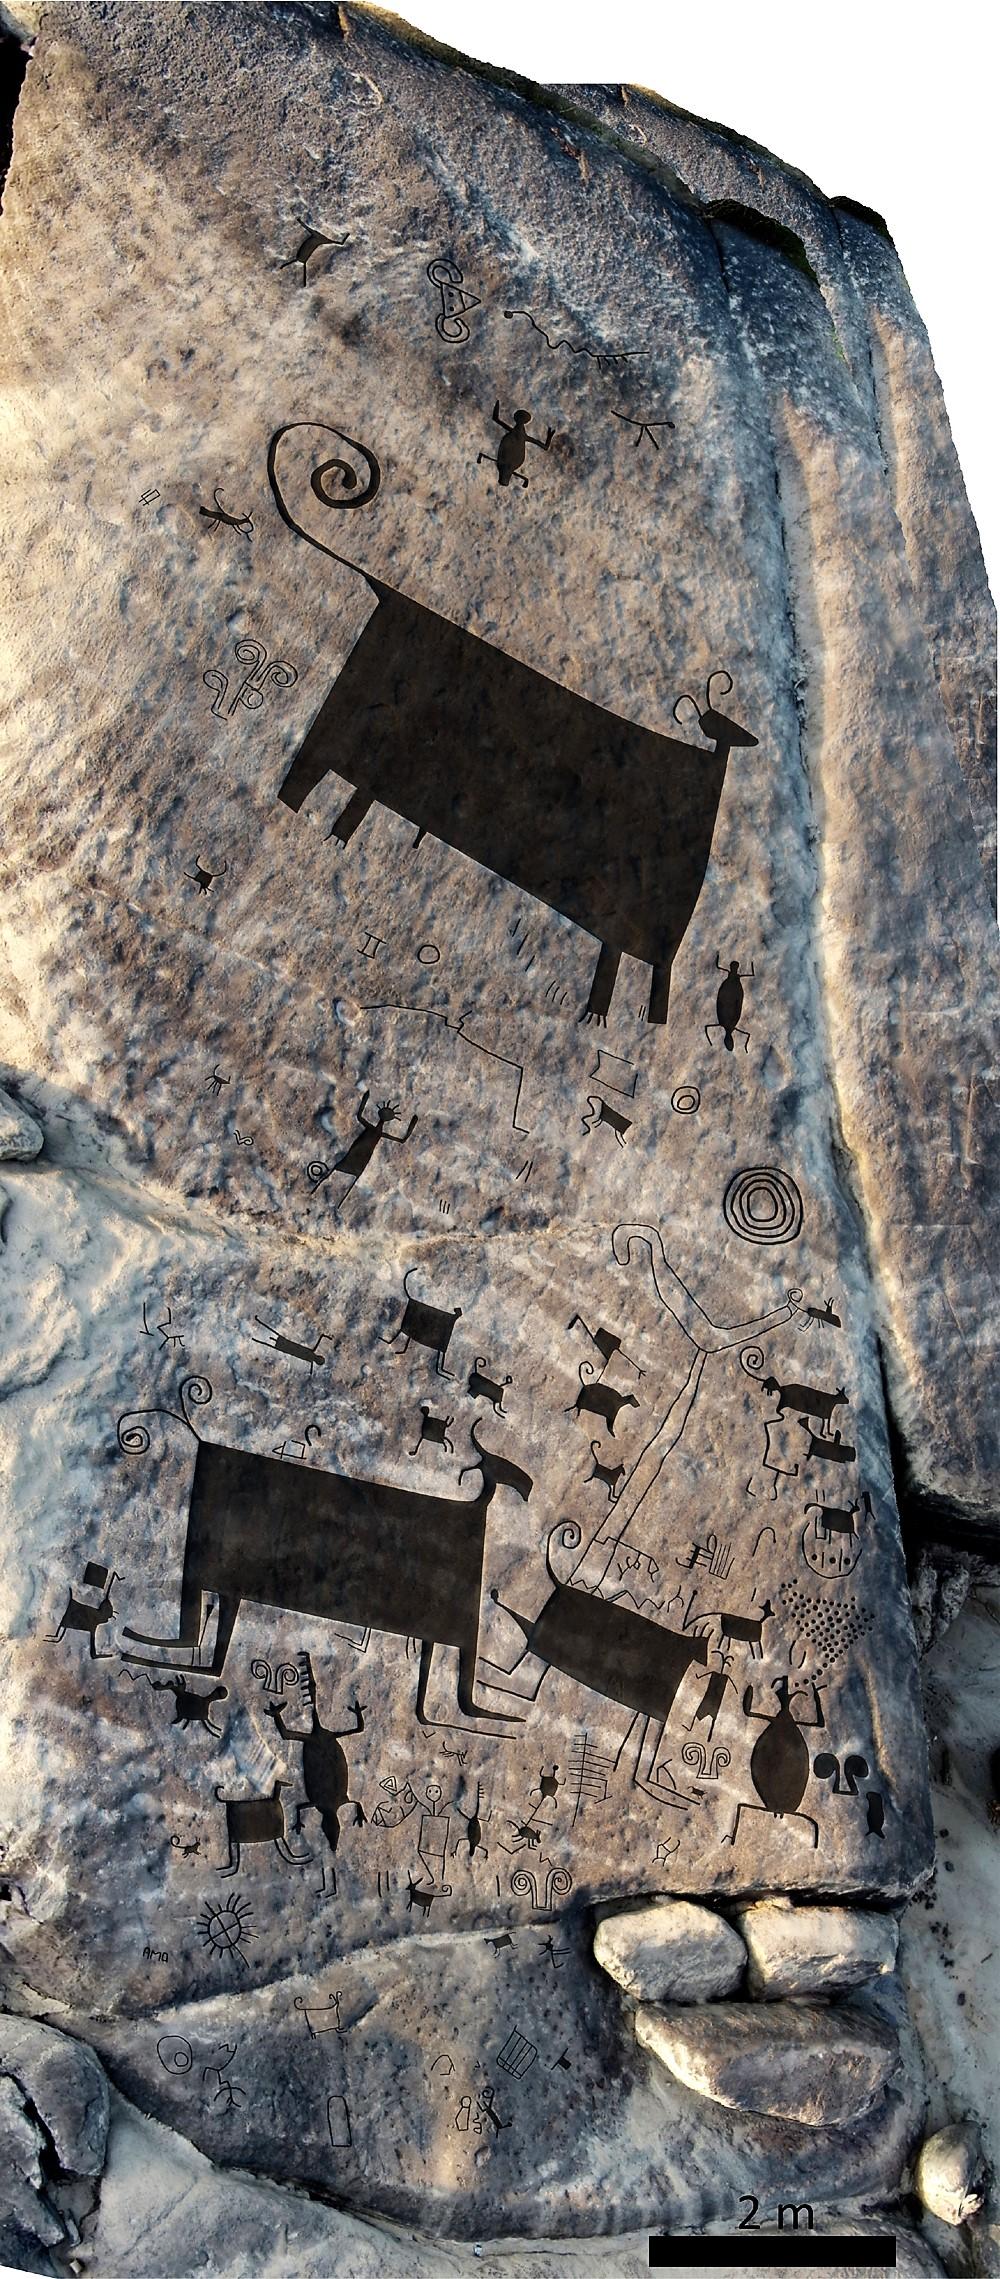 Mapping of Venezuelan rock art